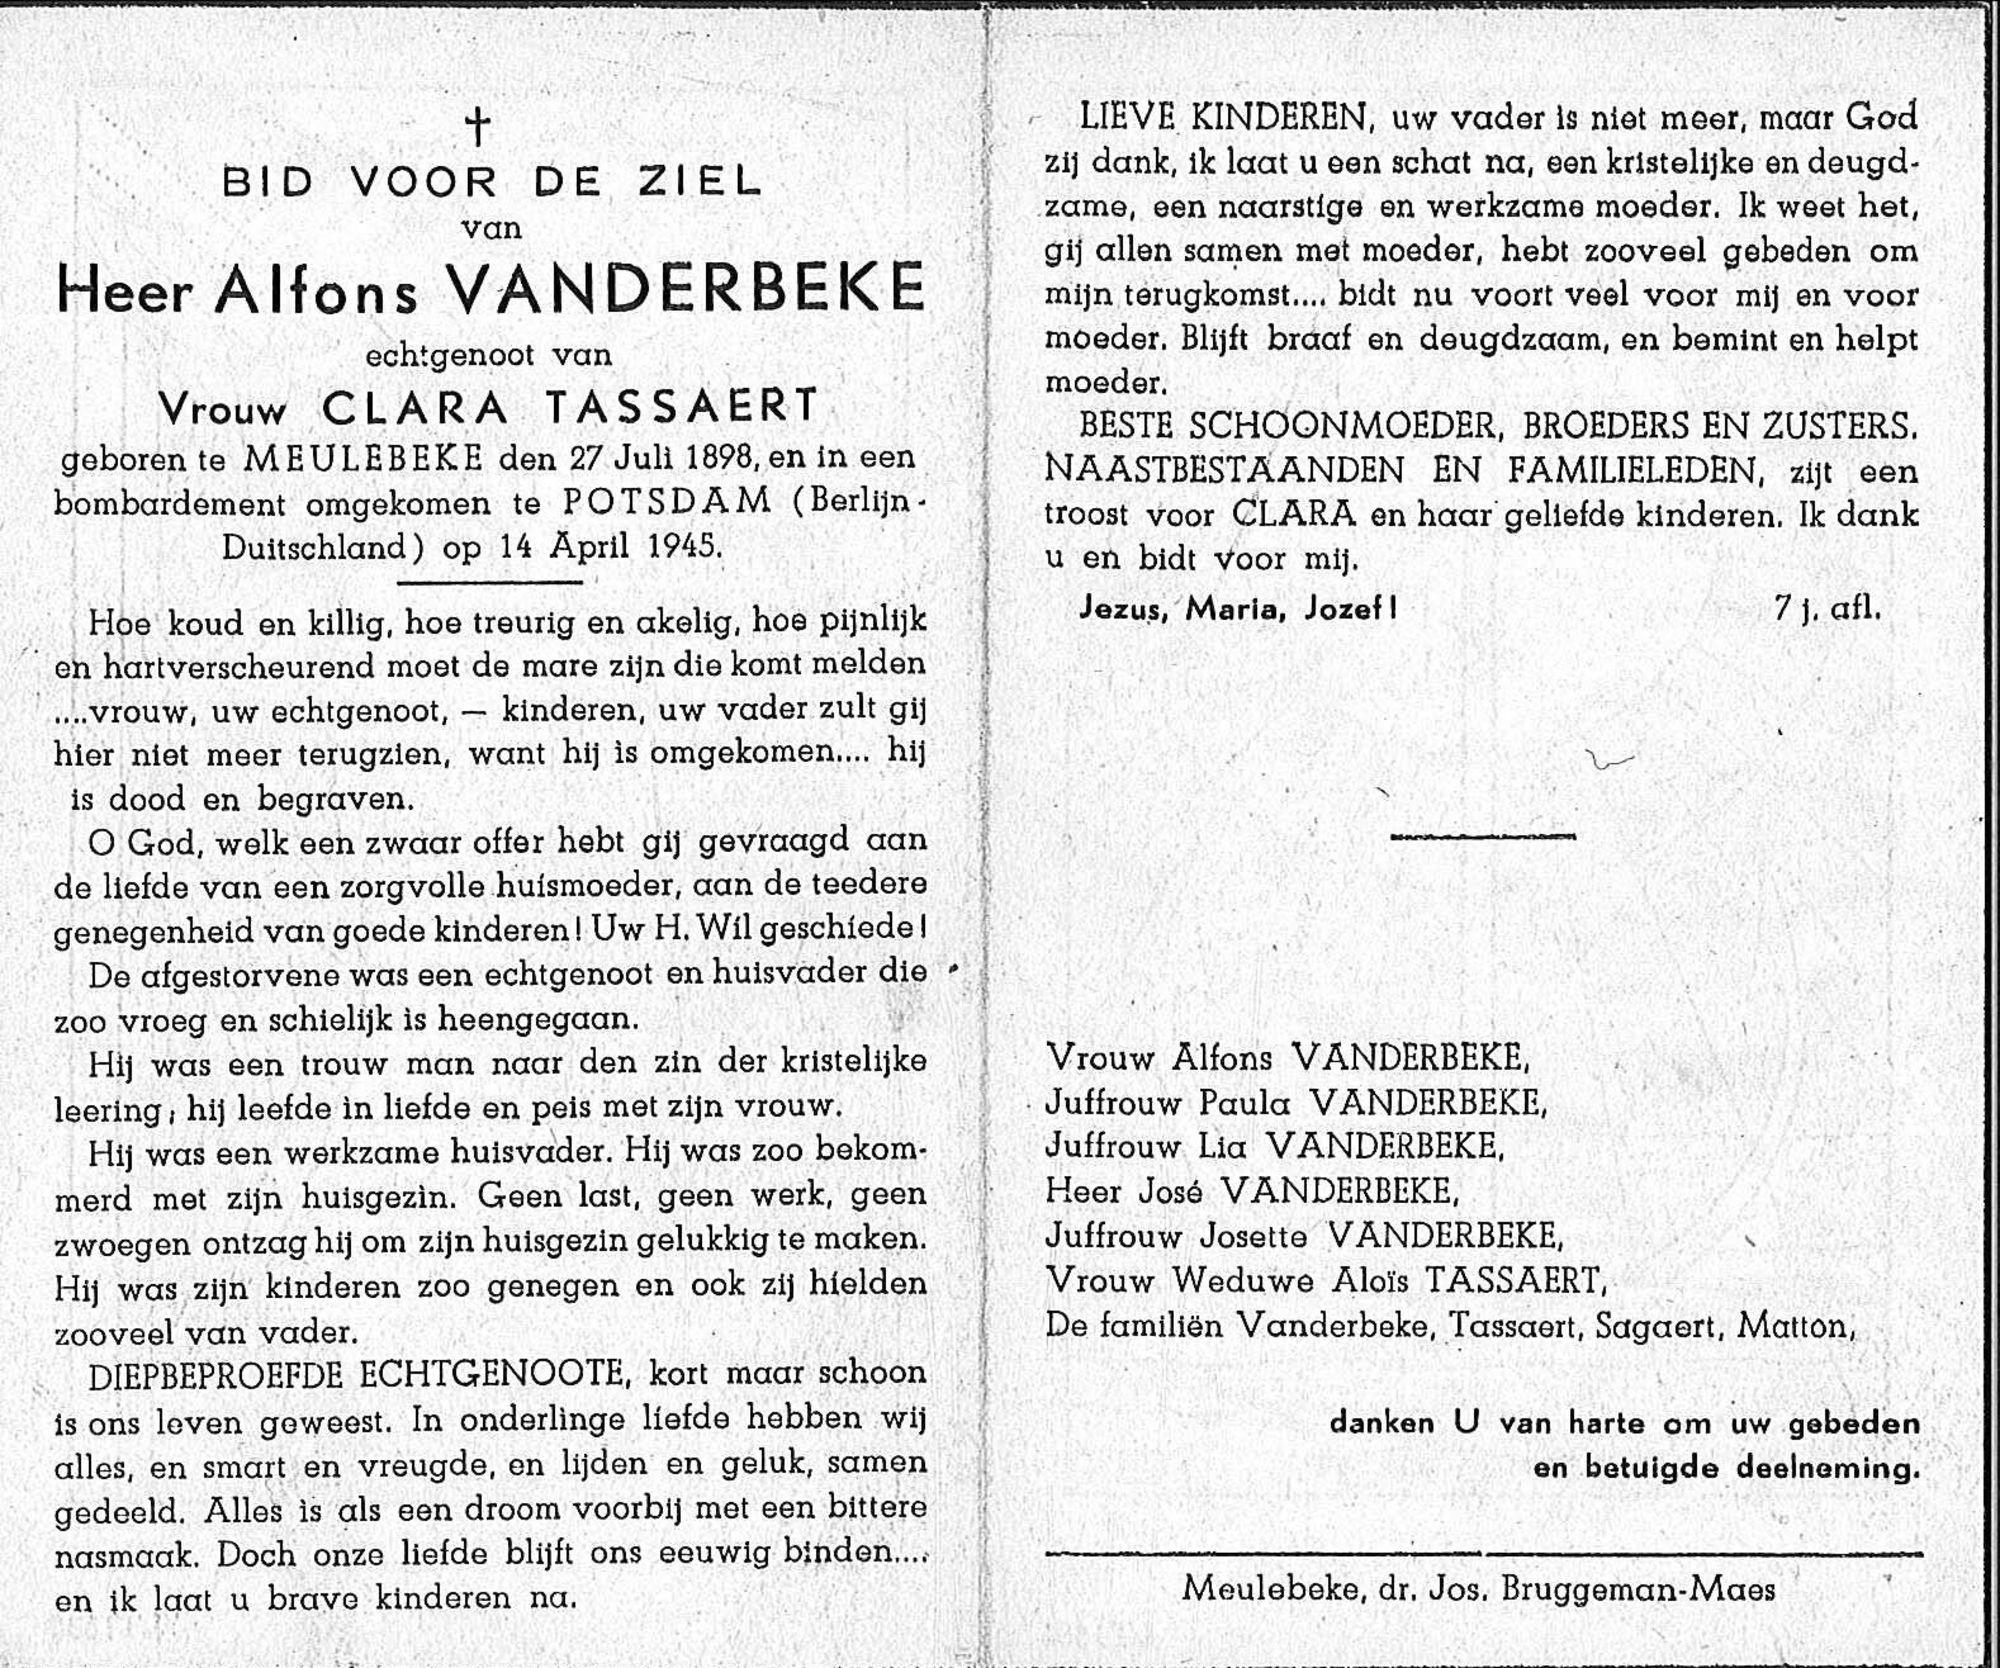 Alfons Vanderbeke